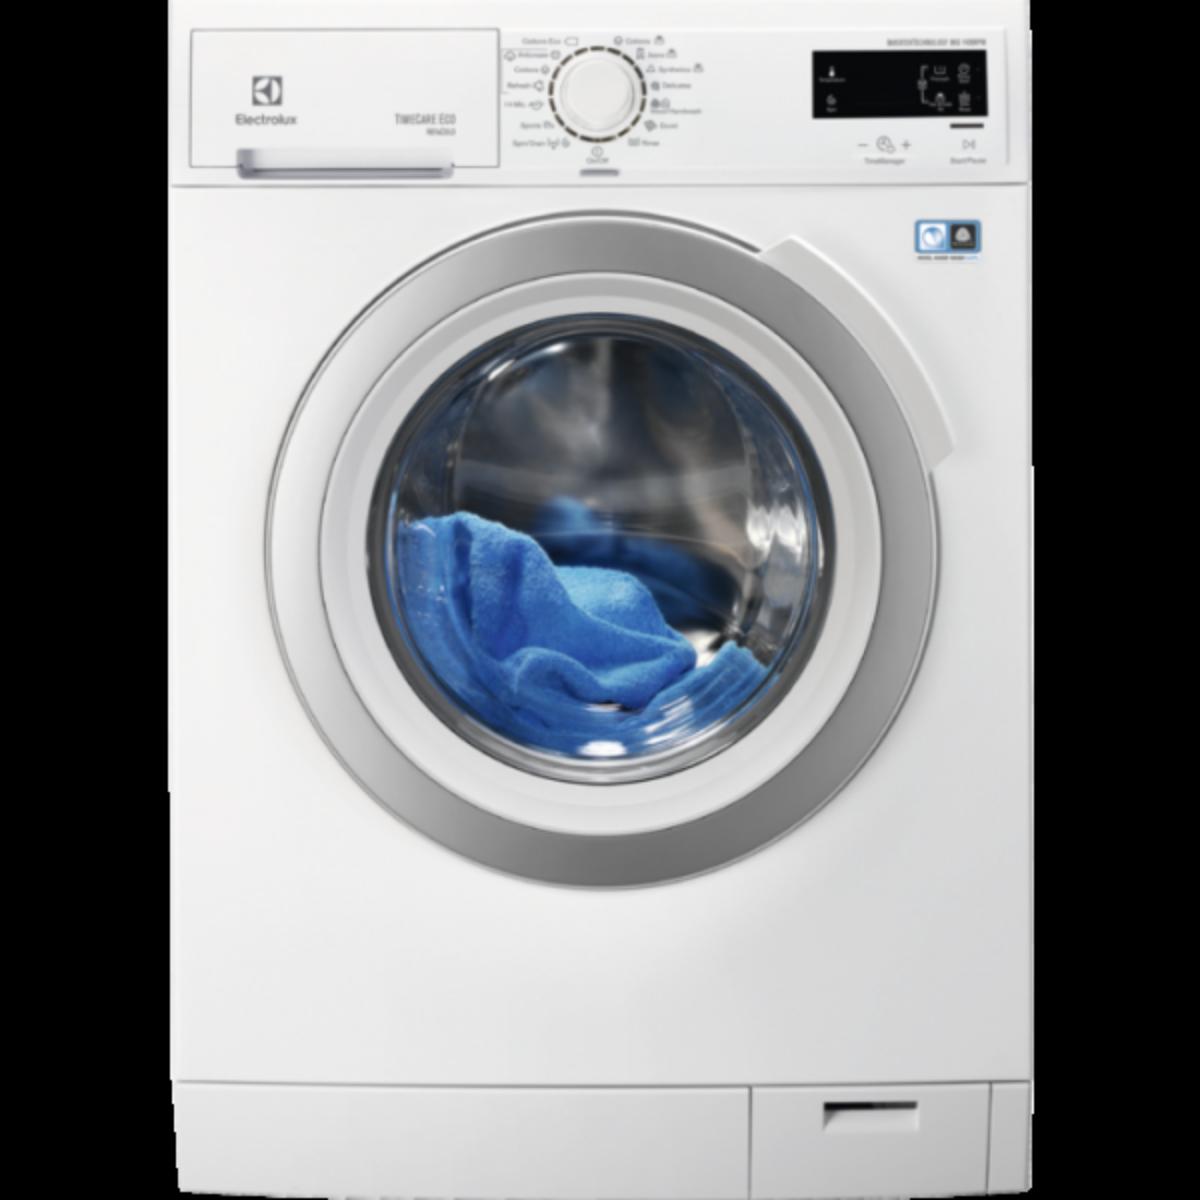 Electrolux vaskemaskin 8 kg 1400 omdr. 10 års motor garanti